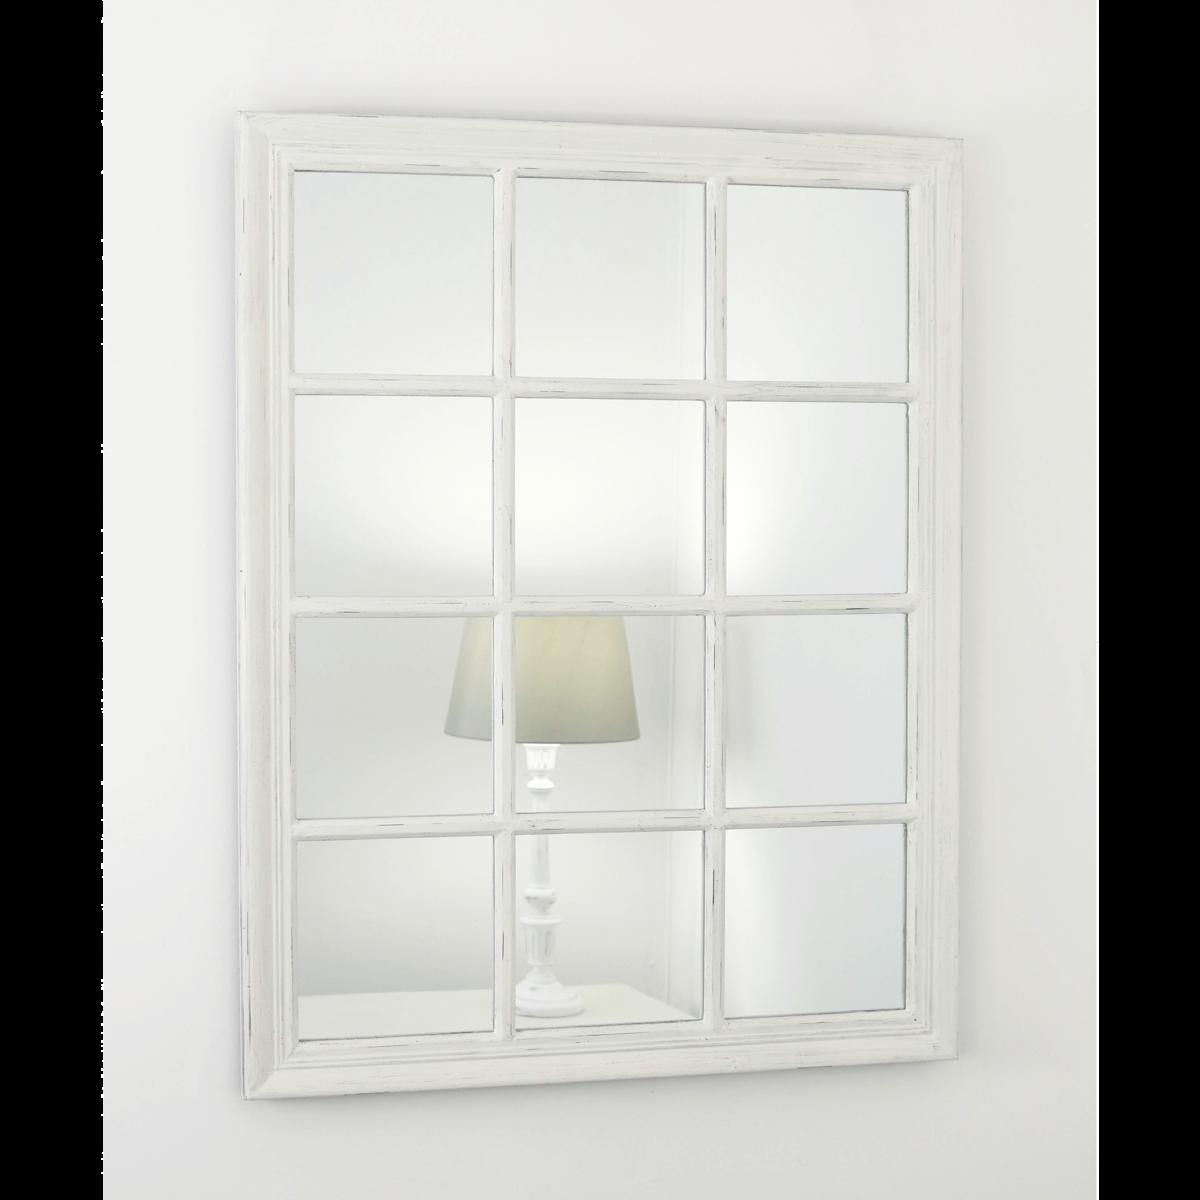 Sasha Vintage White Shabby Chic Rectangular Window Mirror 39 X 30 100cm X 75cm In 2020 Window Mirror Vintage Bathrooms Bathroom Mirror Storage